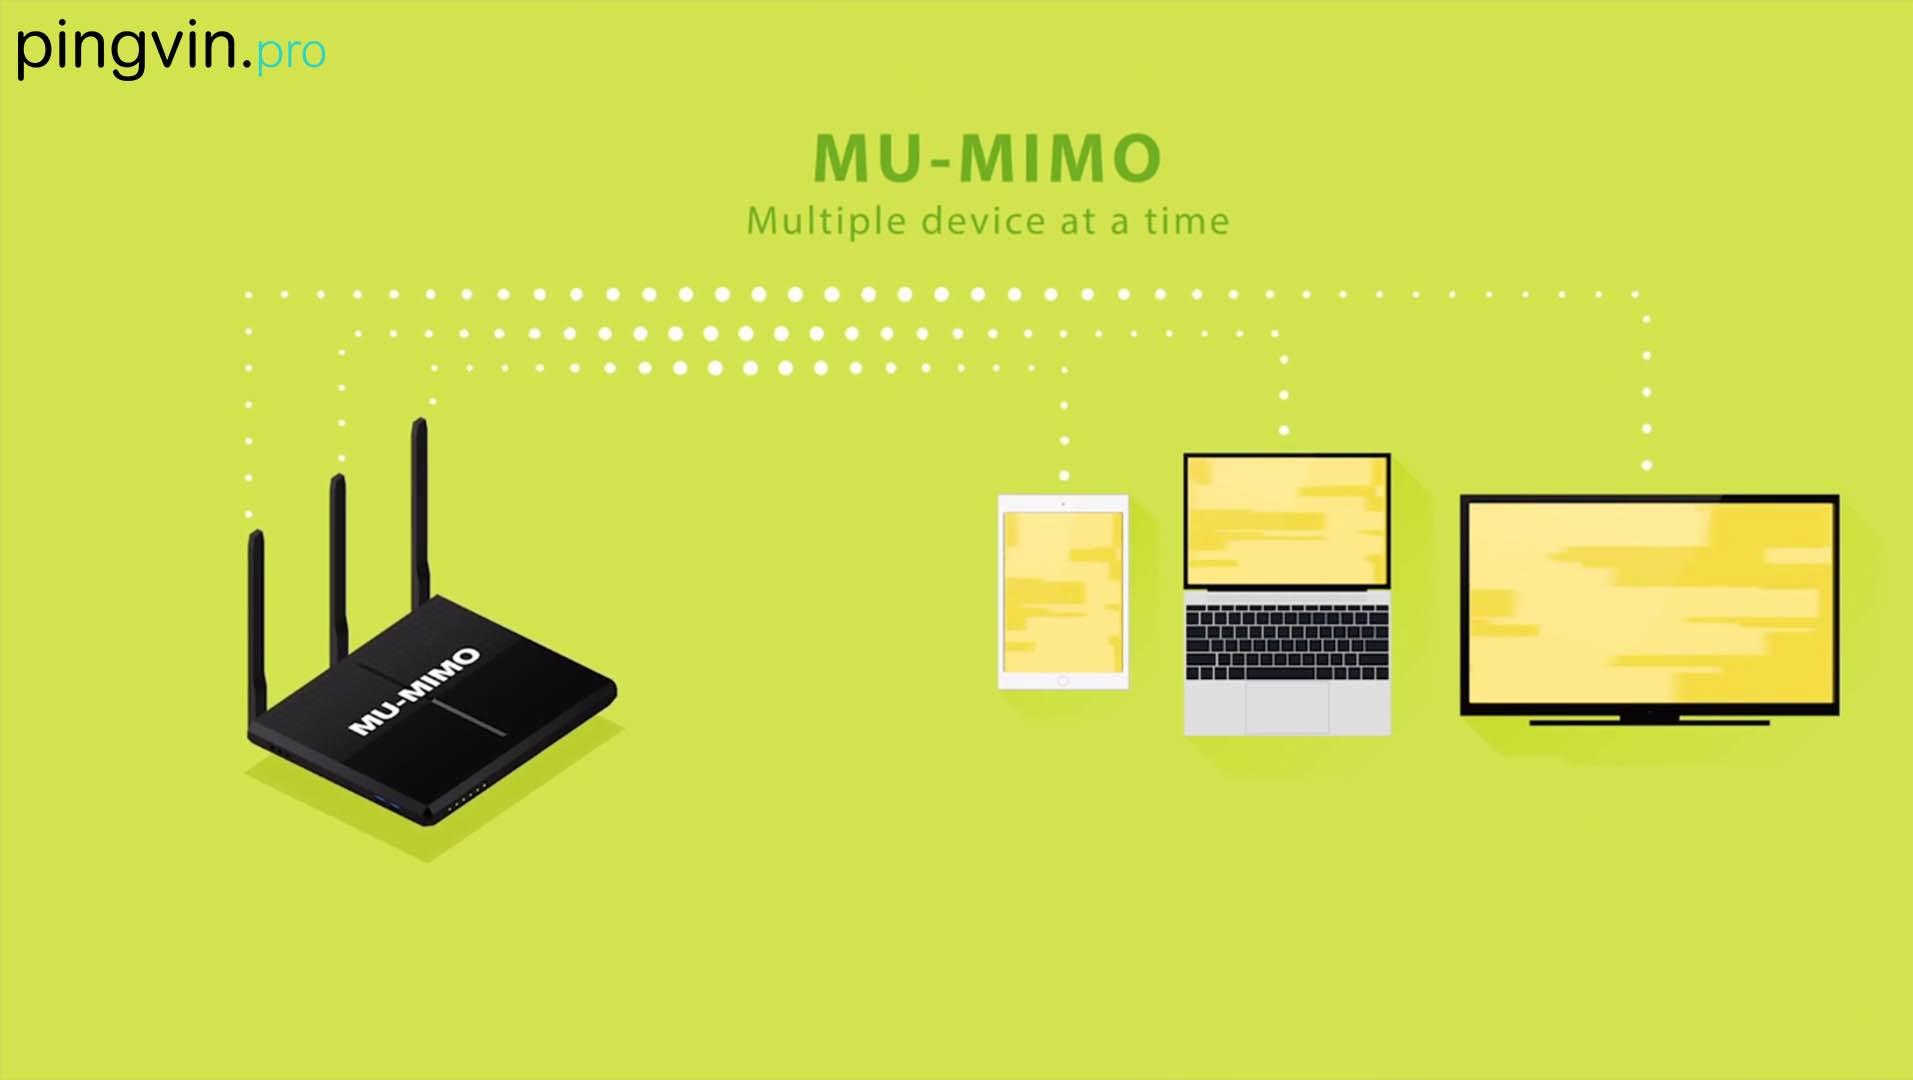 Wi-Fi MU-MIMO